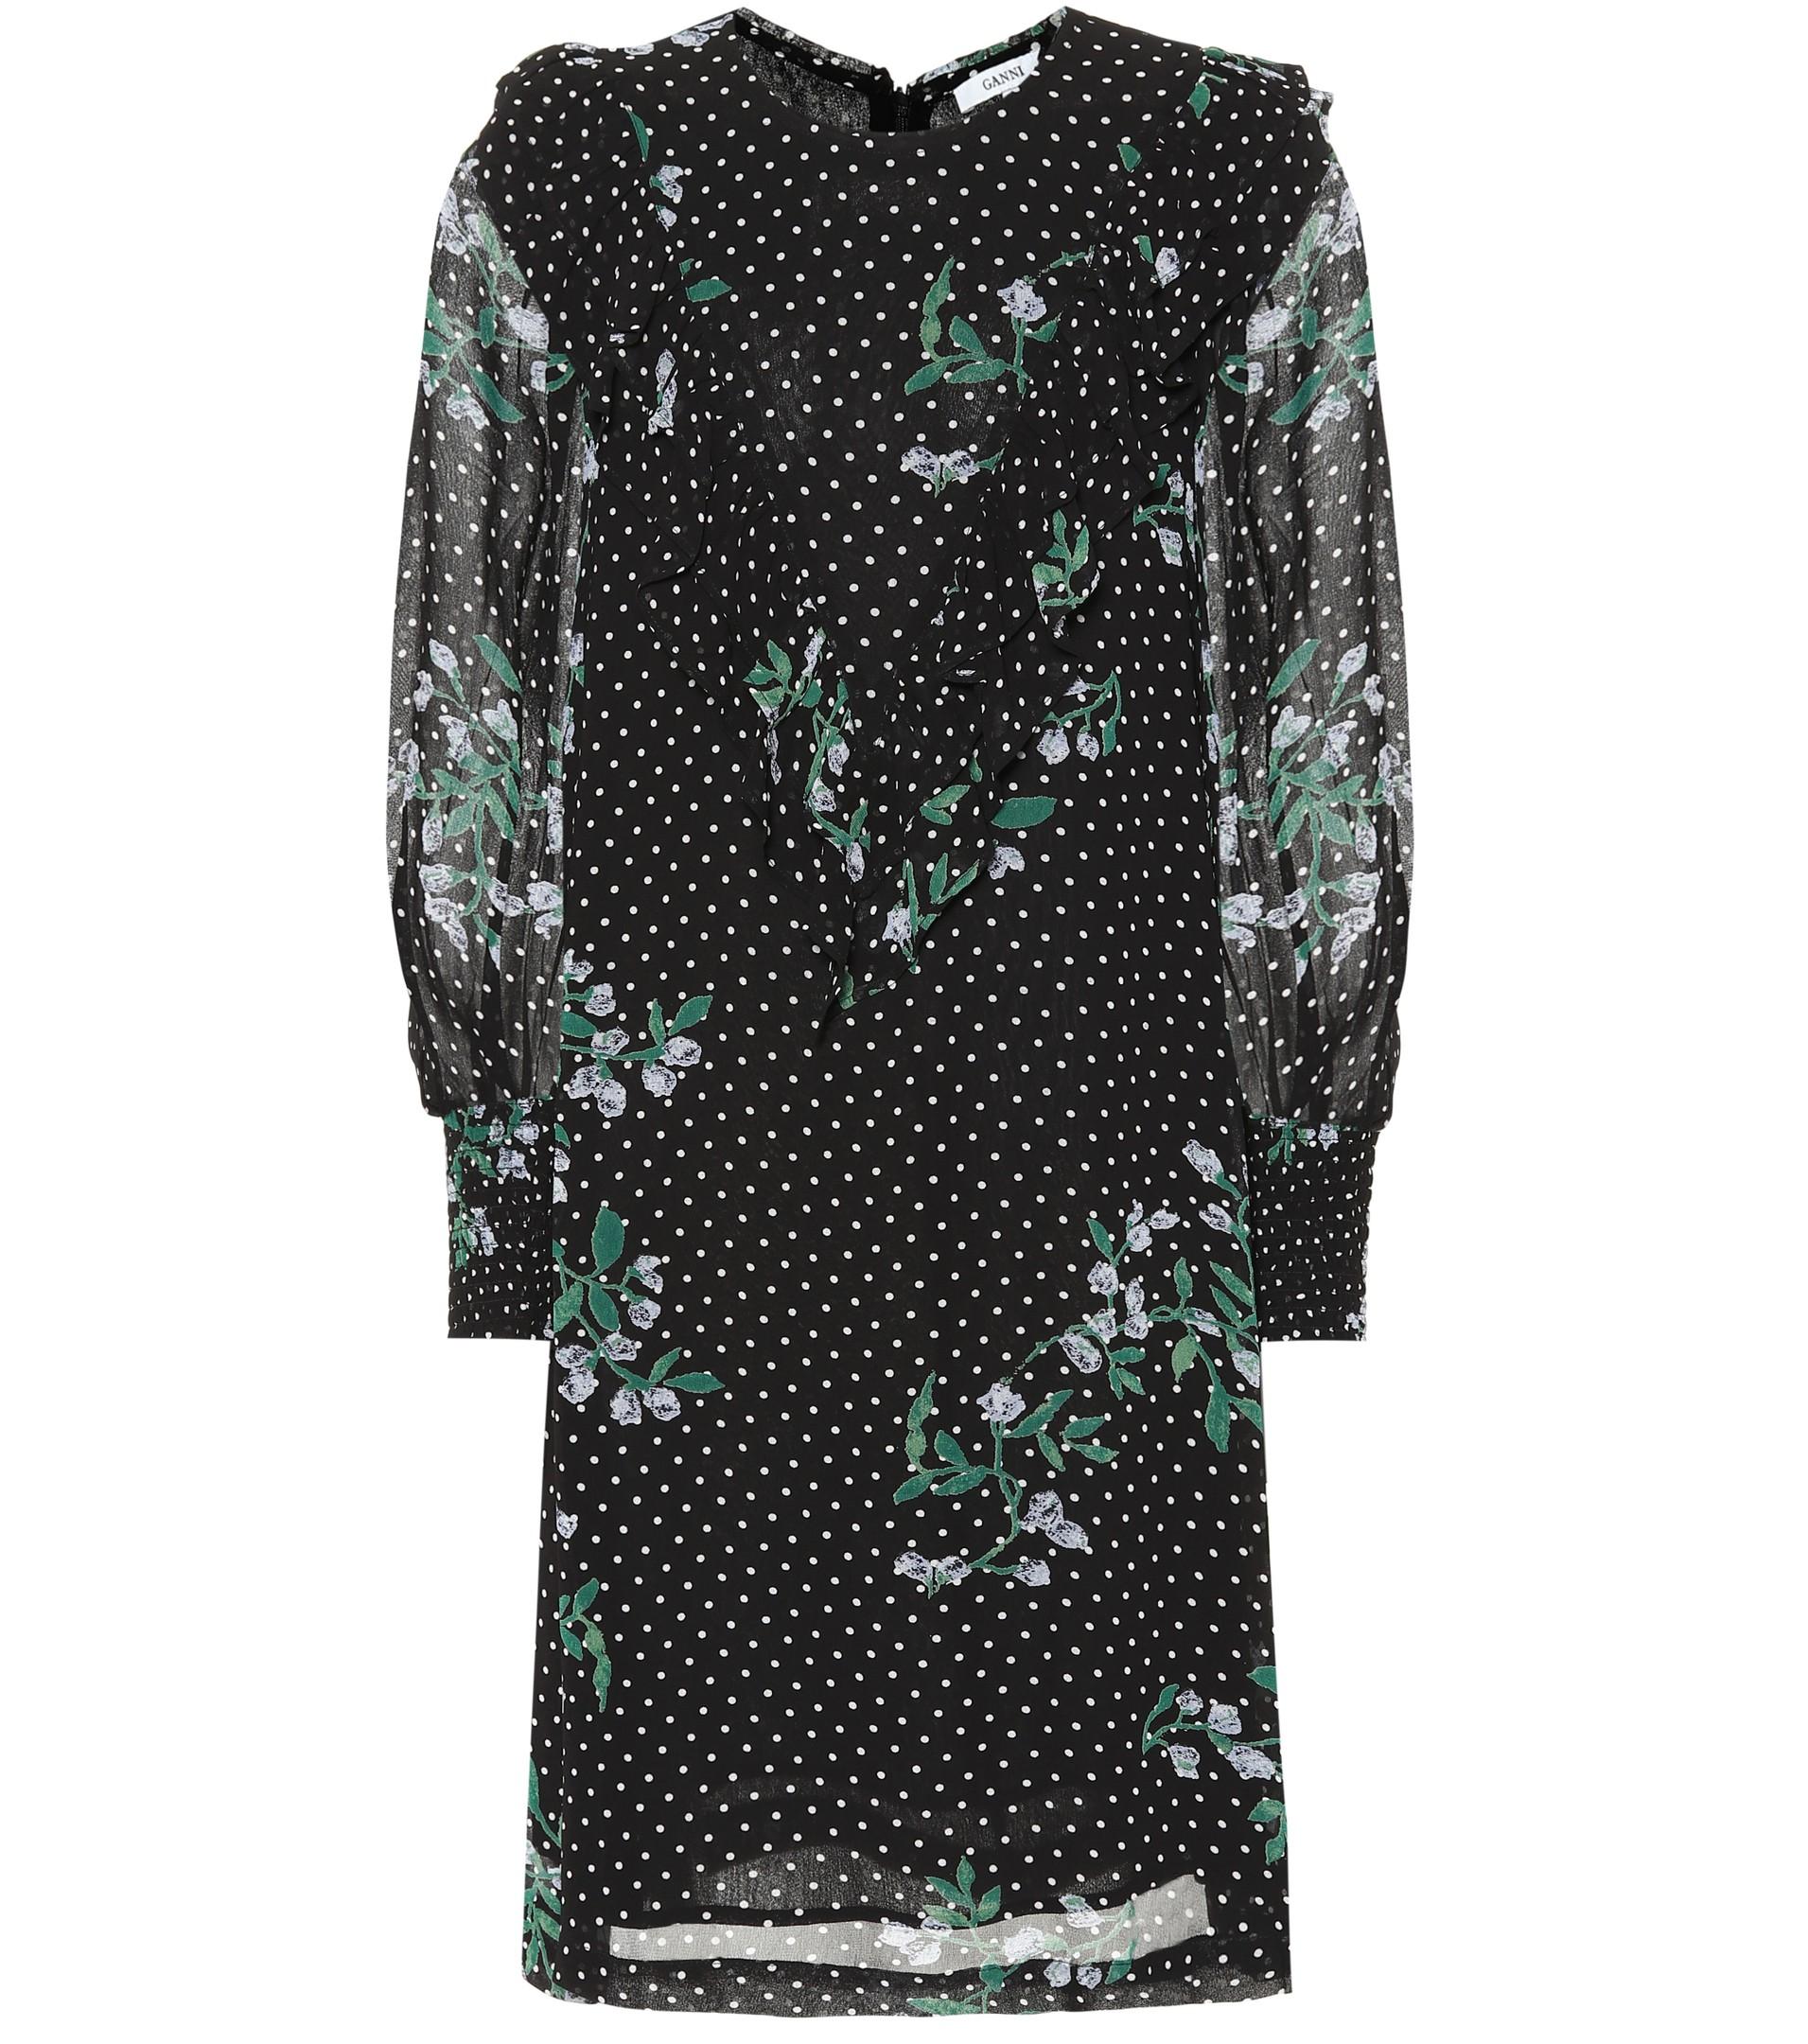 61505fc0 Shop Our Favorite Designer Finds for Fall: Prada, Marc Jacobs